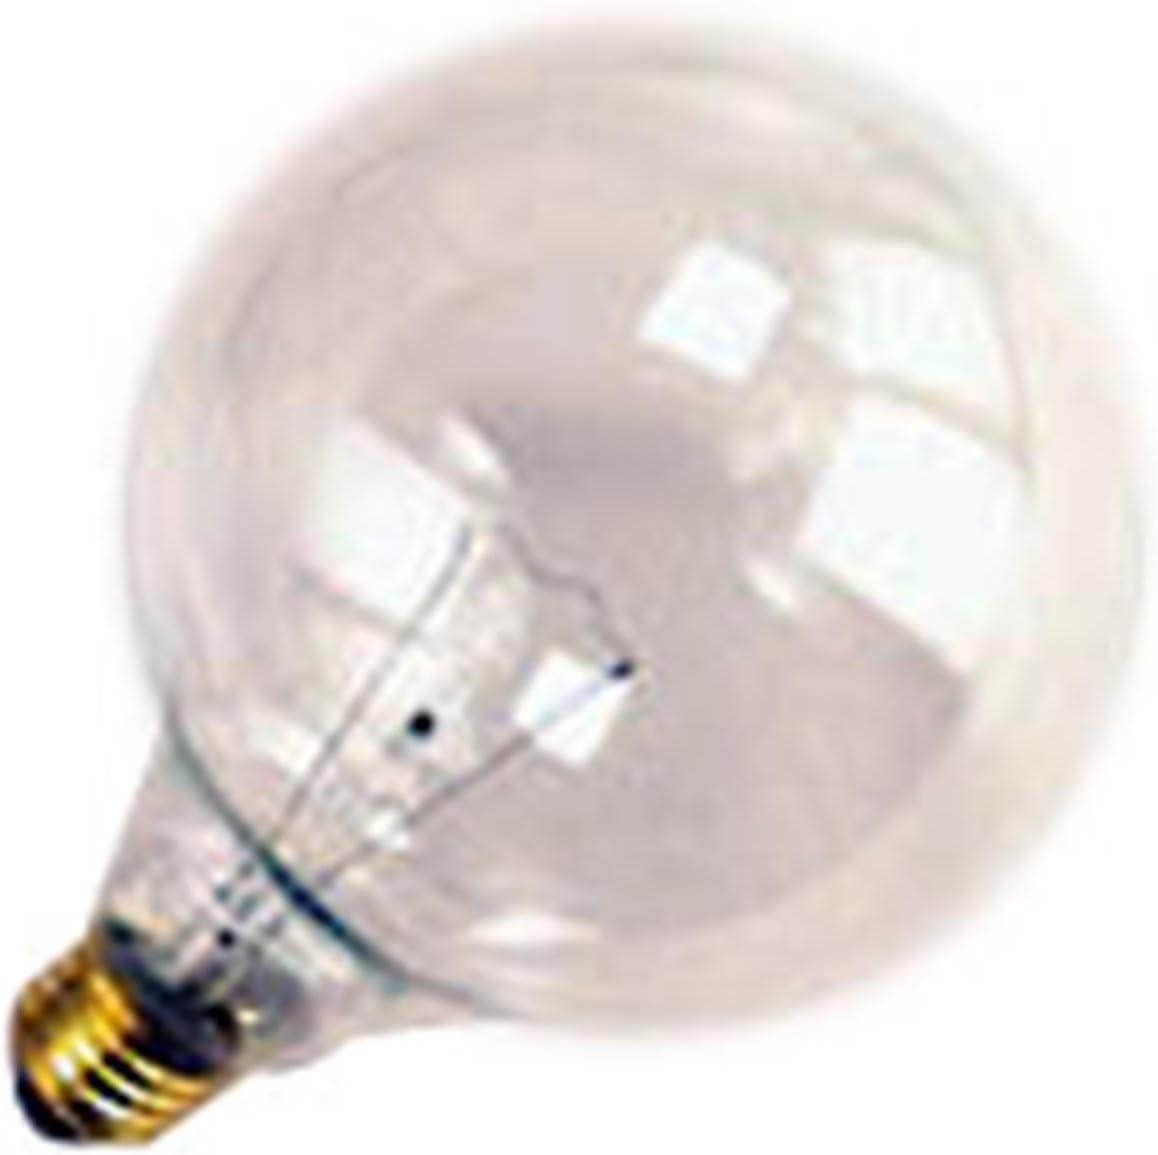 Halco 40W G40 CL Med 130V Halco G40CL40 40w 130v Incandescent Clear Lamp Bulb 12 Qty